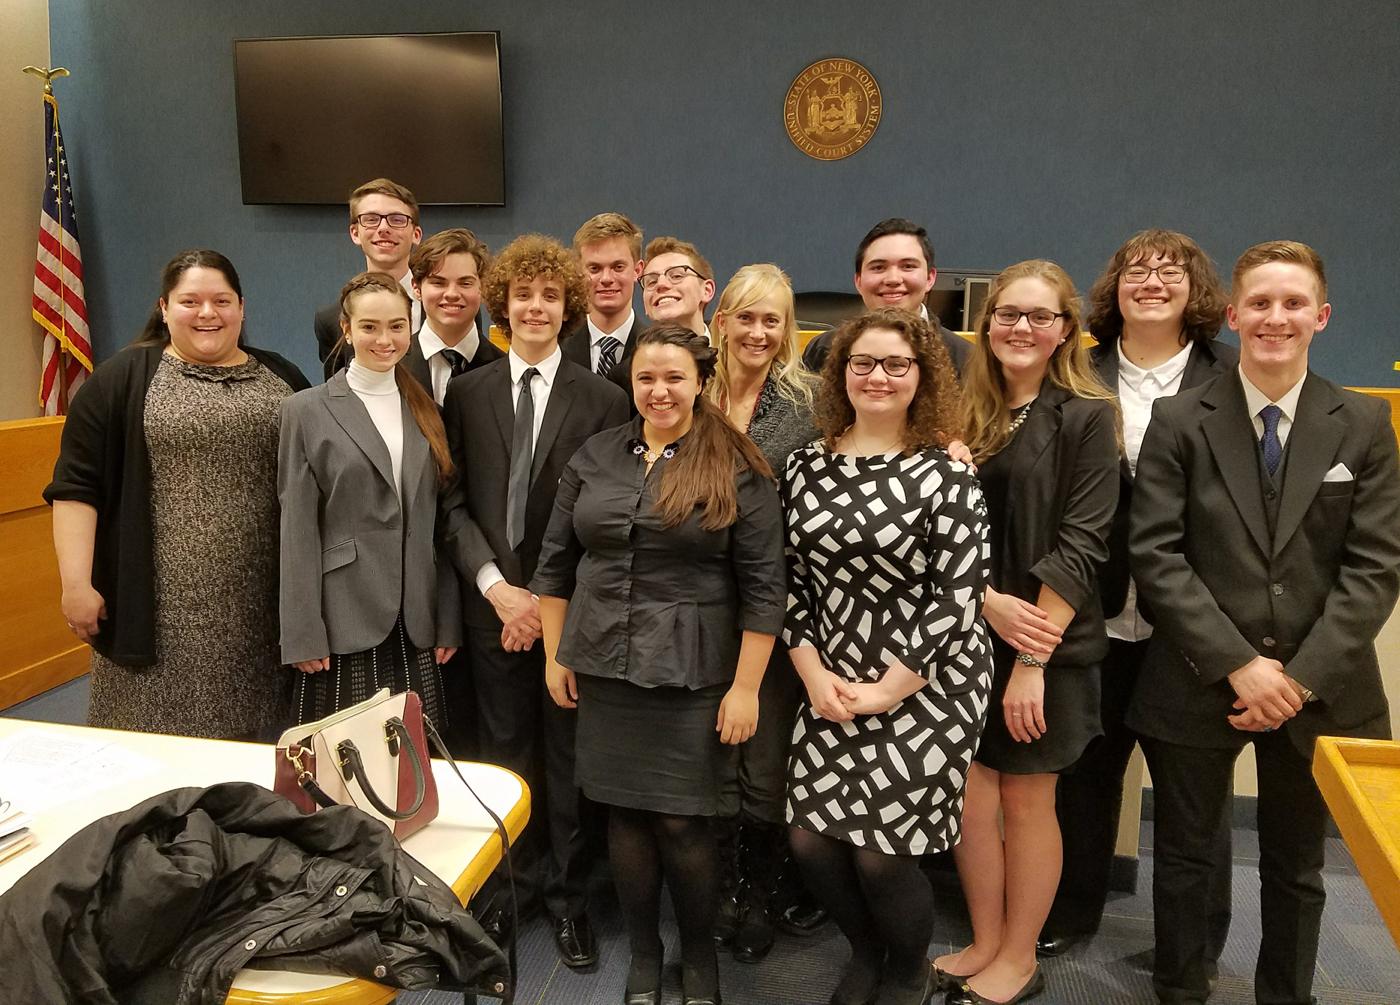 Hilton High School's Mock Trial Team. Provided photo